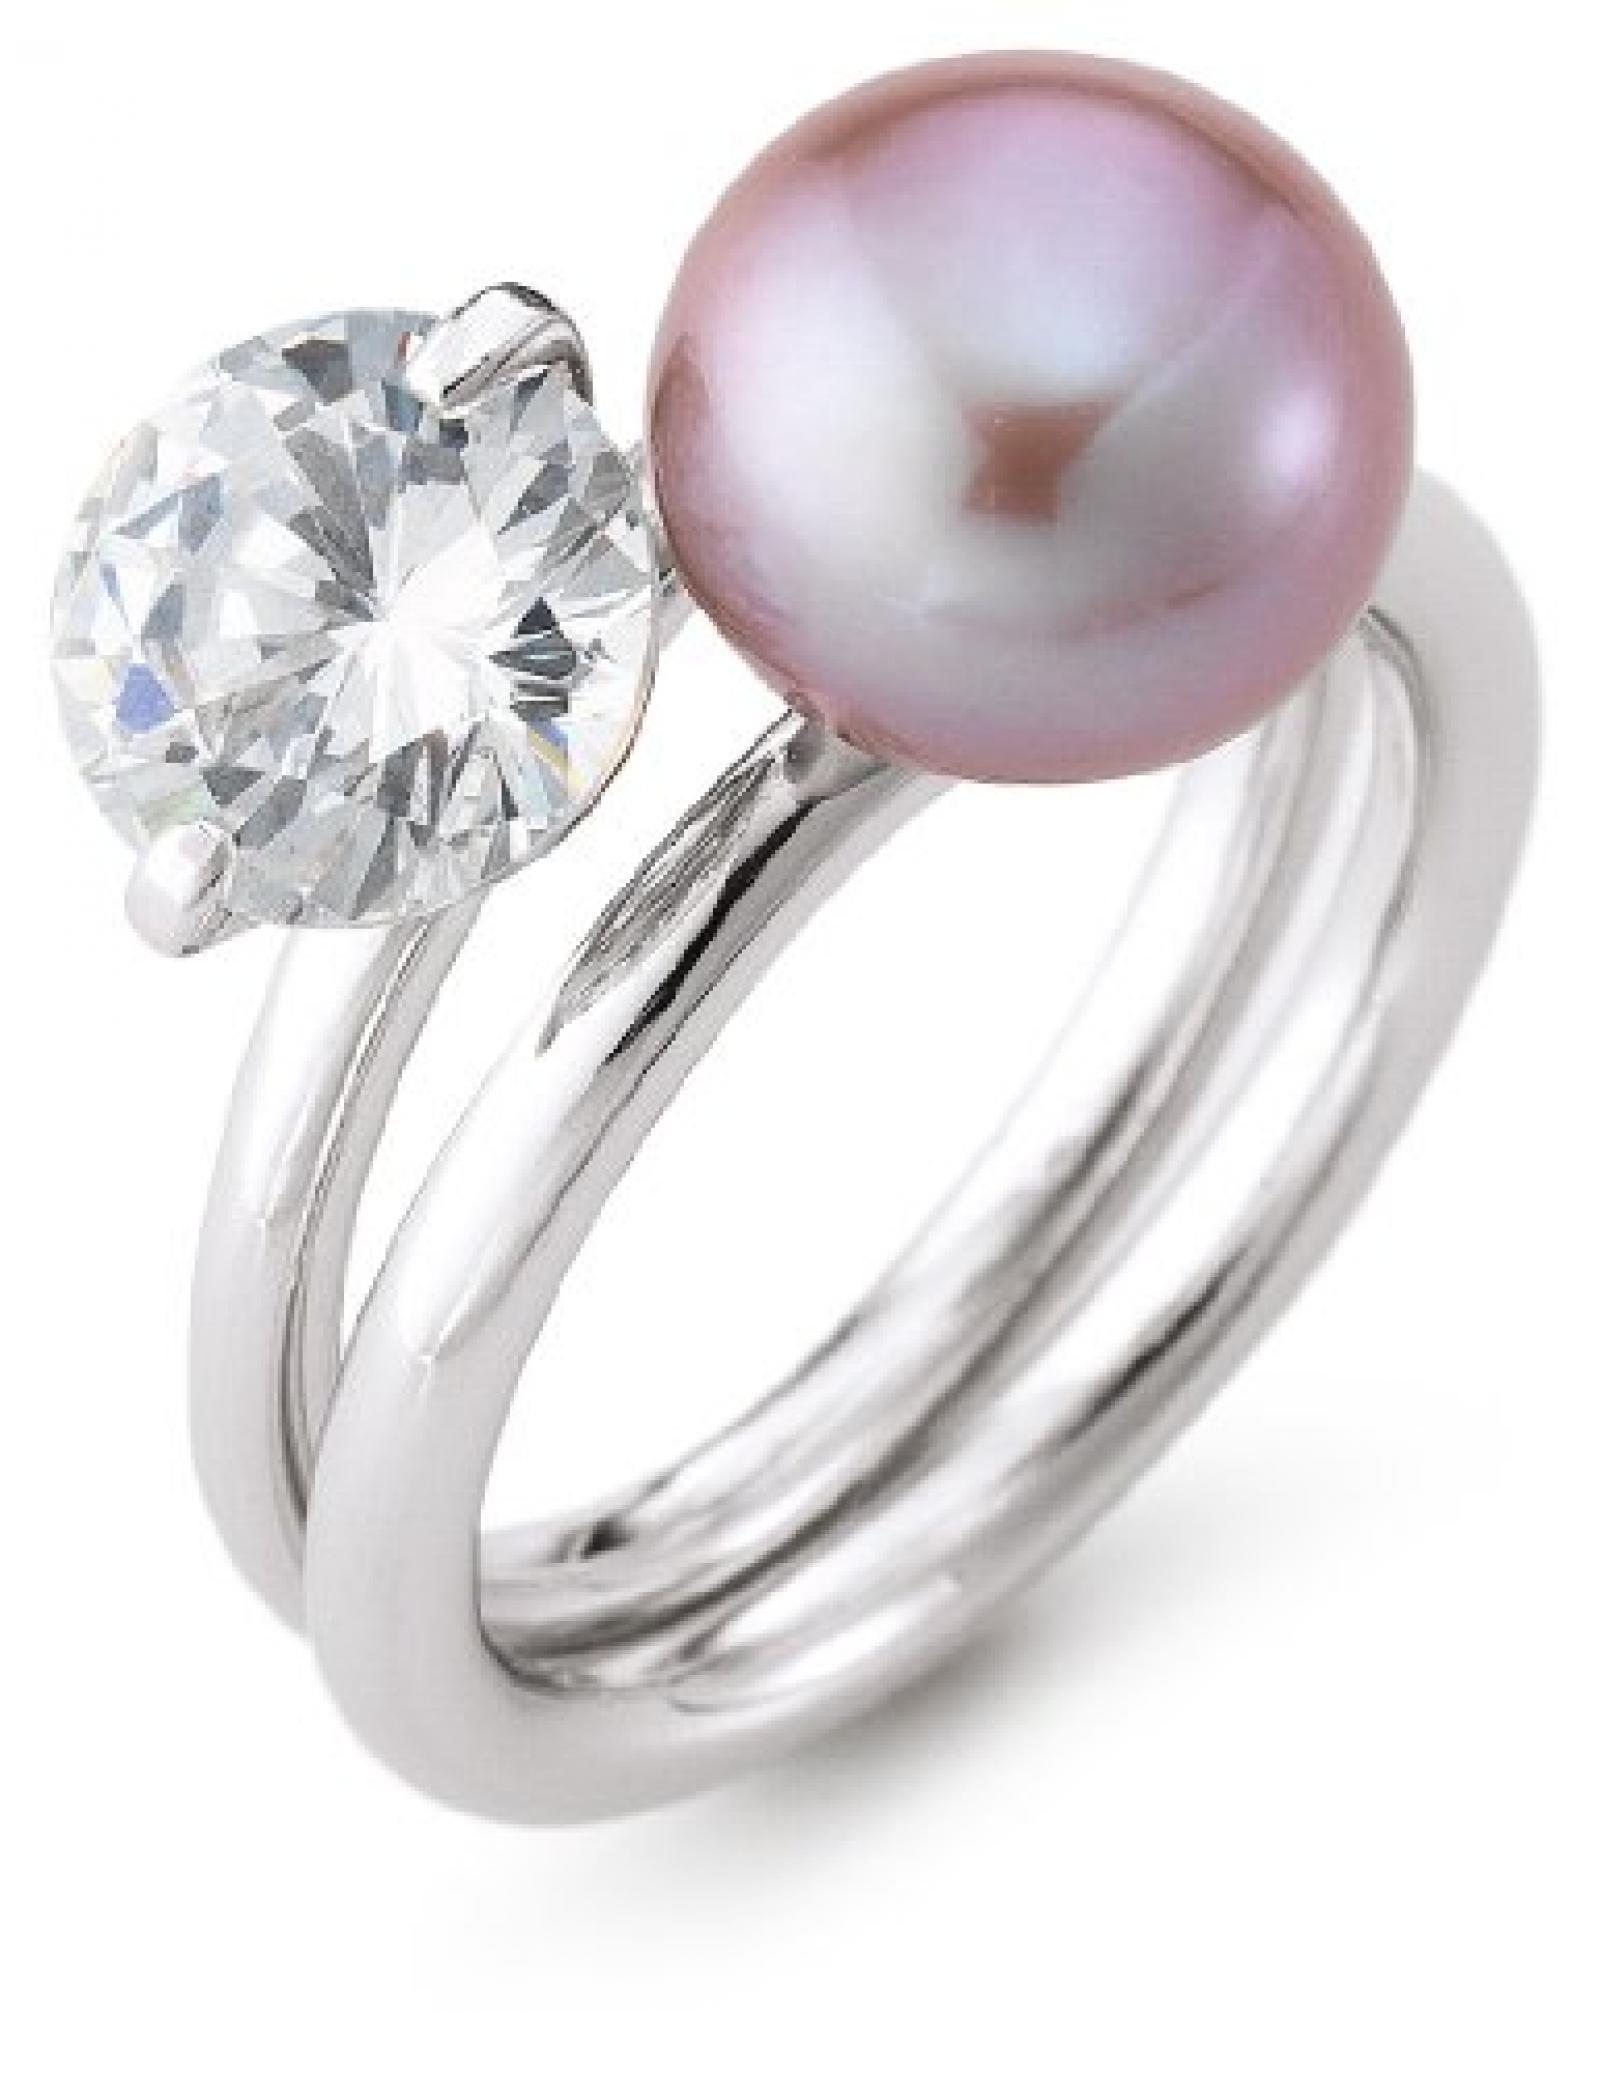 Adriana Damen-Ring Romantica Süßwasser Zuchtperle Zirkonia 2er Set 925 Sterling-Silber Gr. 60 R19-60